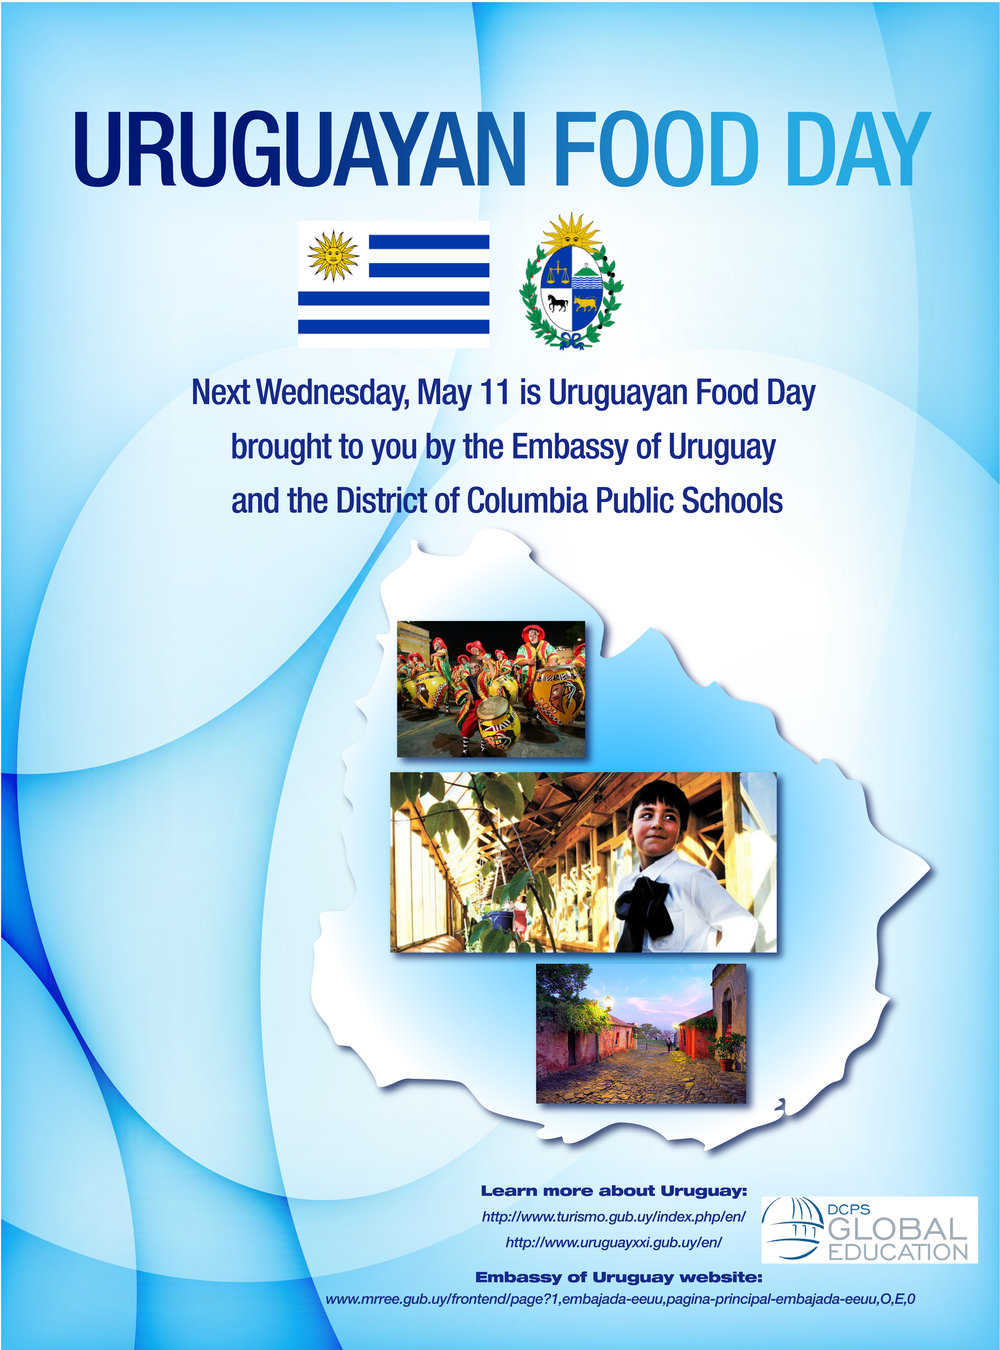 Uruguayan Food Day Poster.jpg